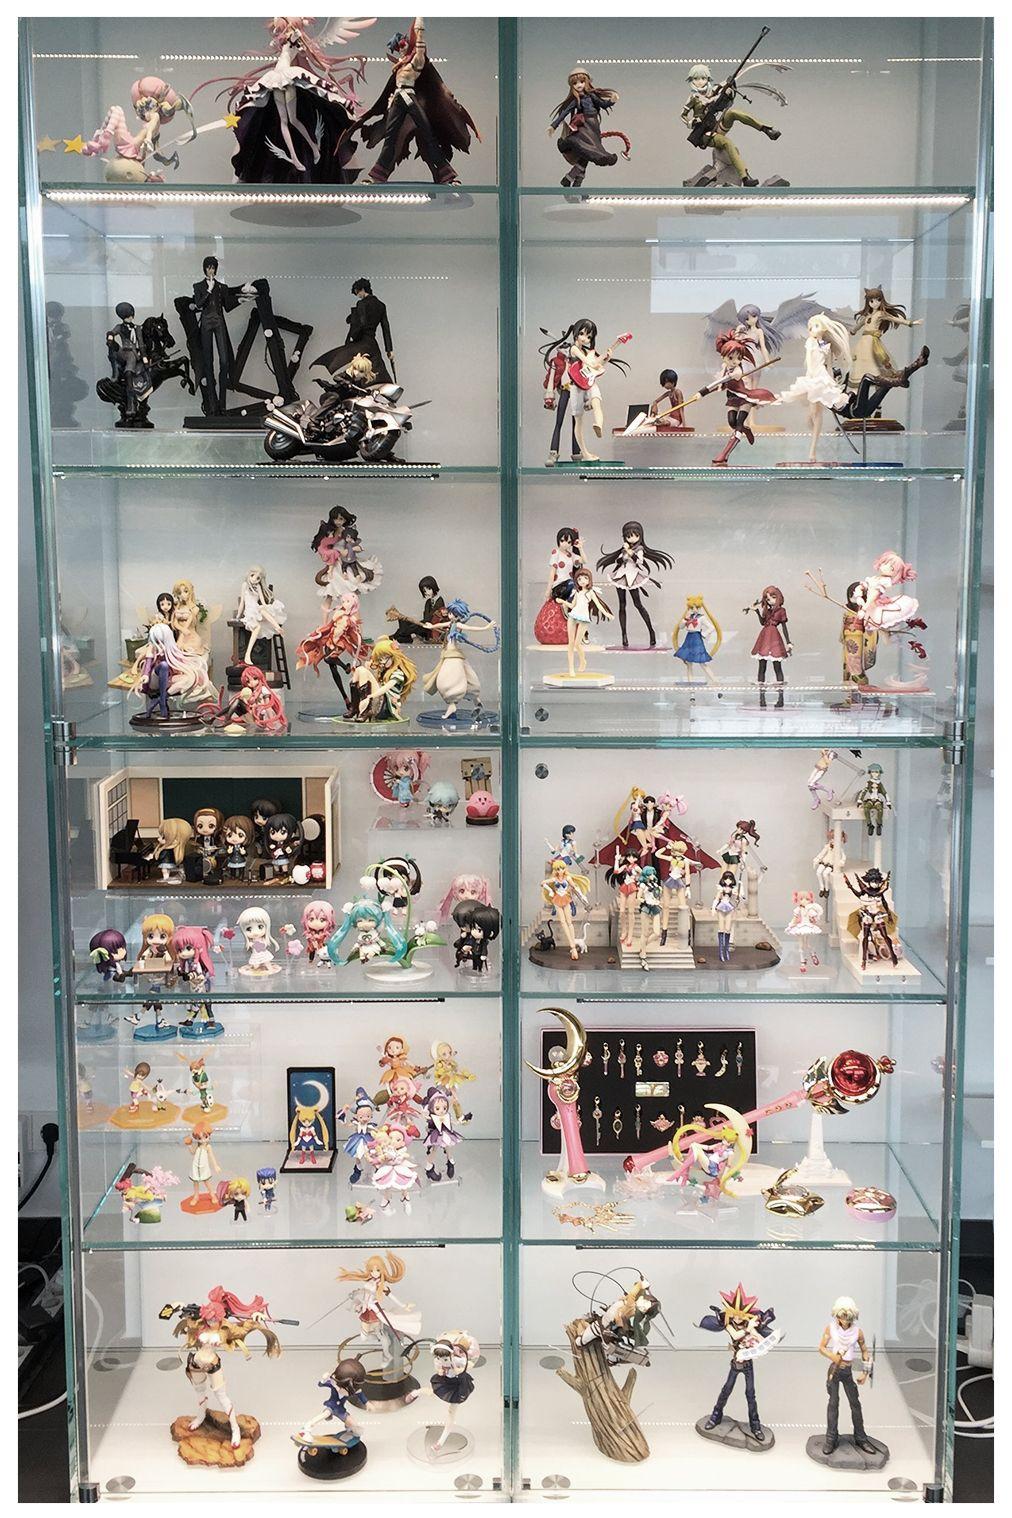 Anime bedroom ideas in 2020 20 charming ideas